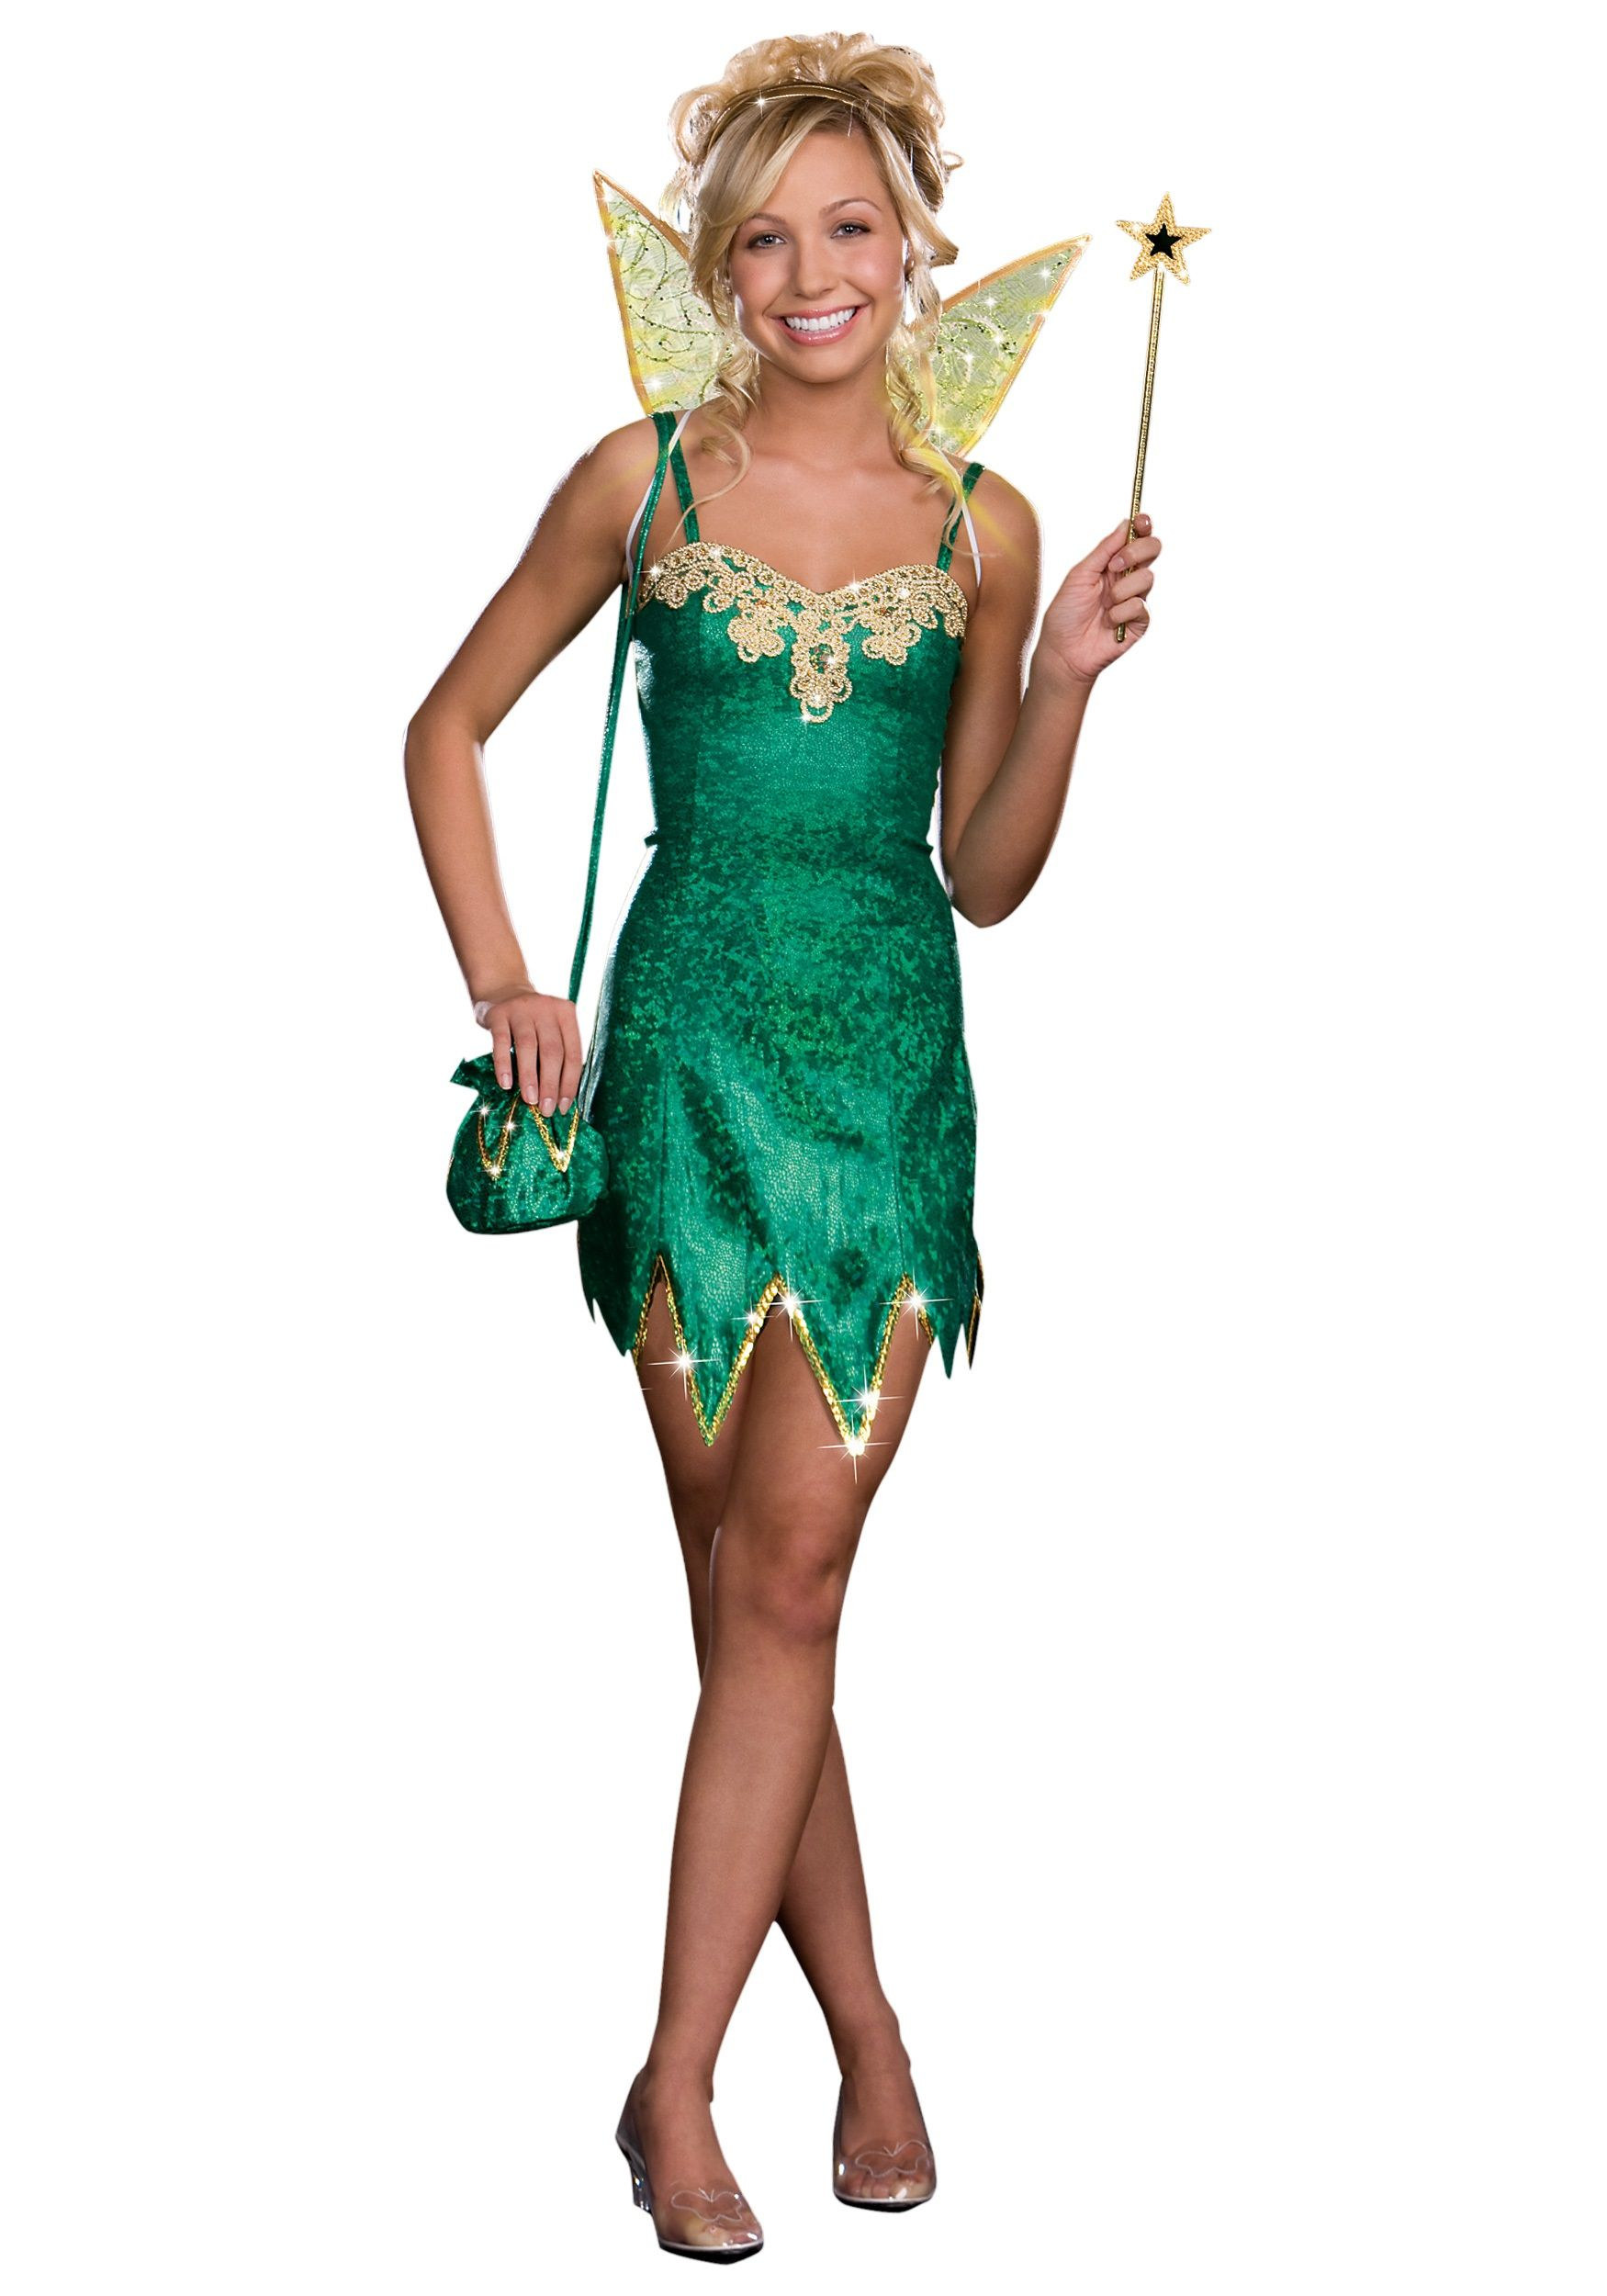 teenage halloween costumes | Home Halloween Costume Ideas Fairy Costumes Child Fairy Costumes Teen .  sc 1 st  Pinterest & teenage halloween costumes | Home Halloween Costume Ideas Fairy ...